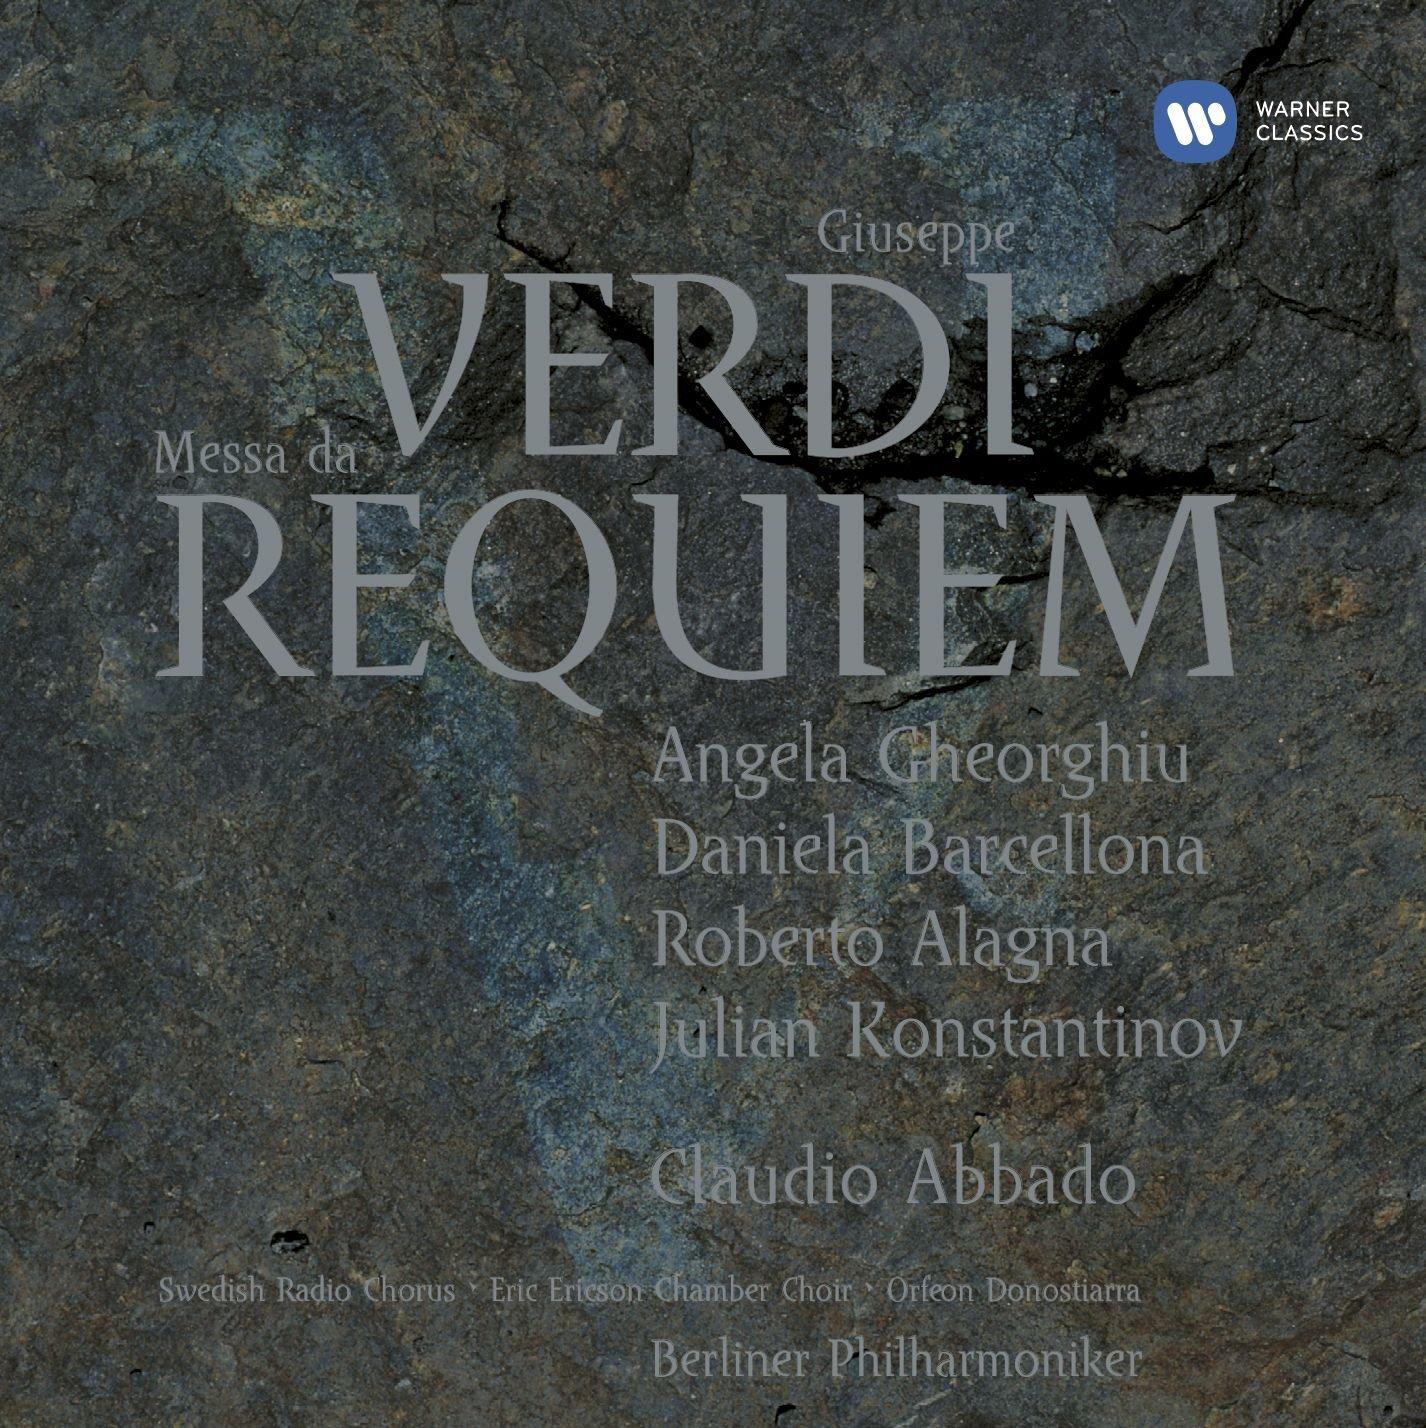 Verdi: Messa da Requiem by Warner Classics